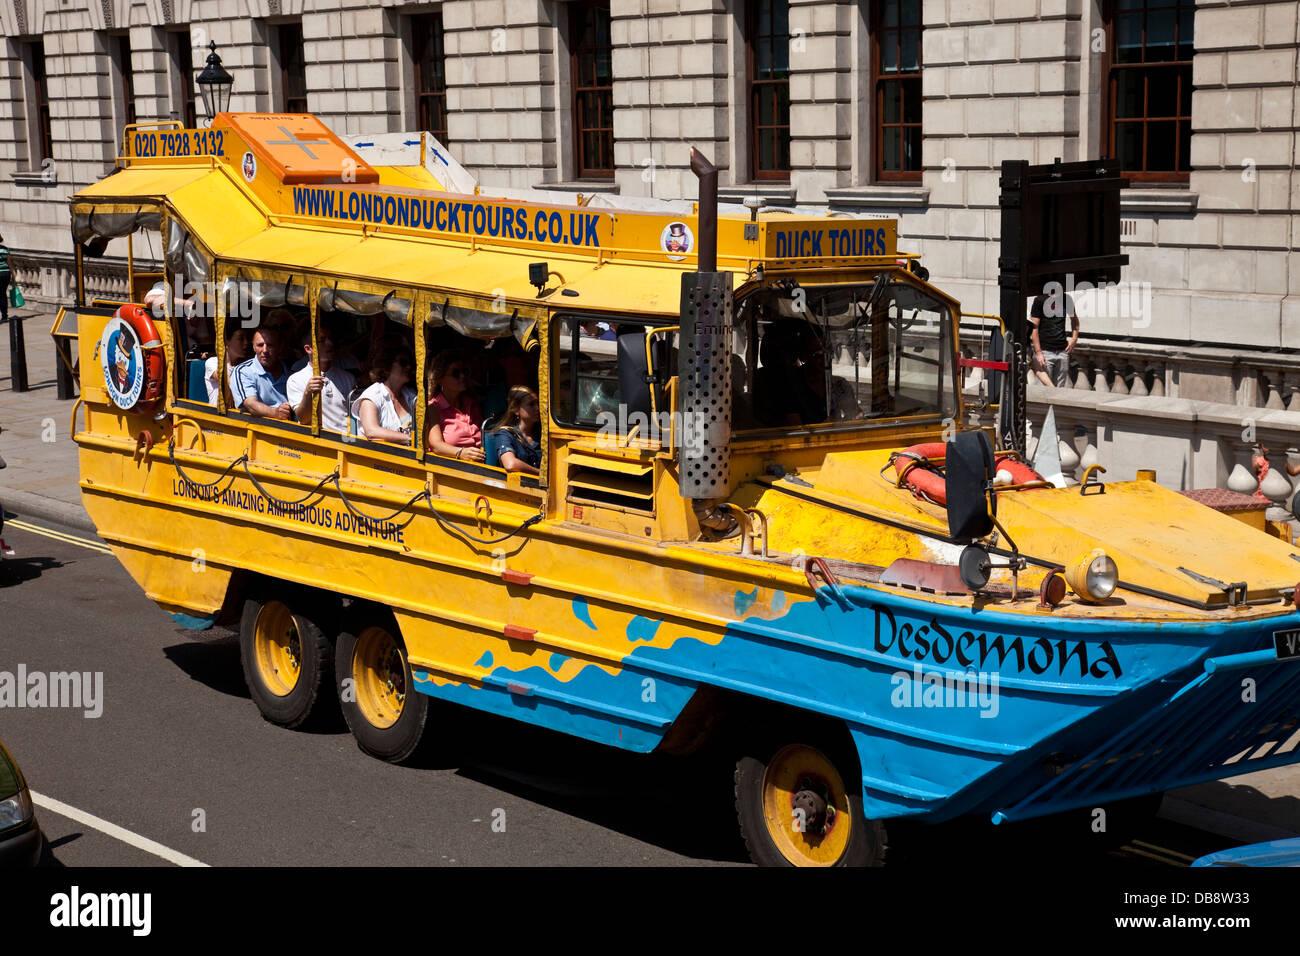 European Vacation Bus Tours